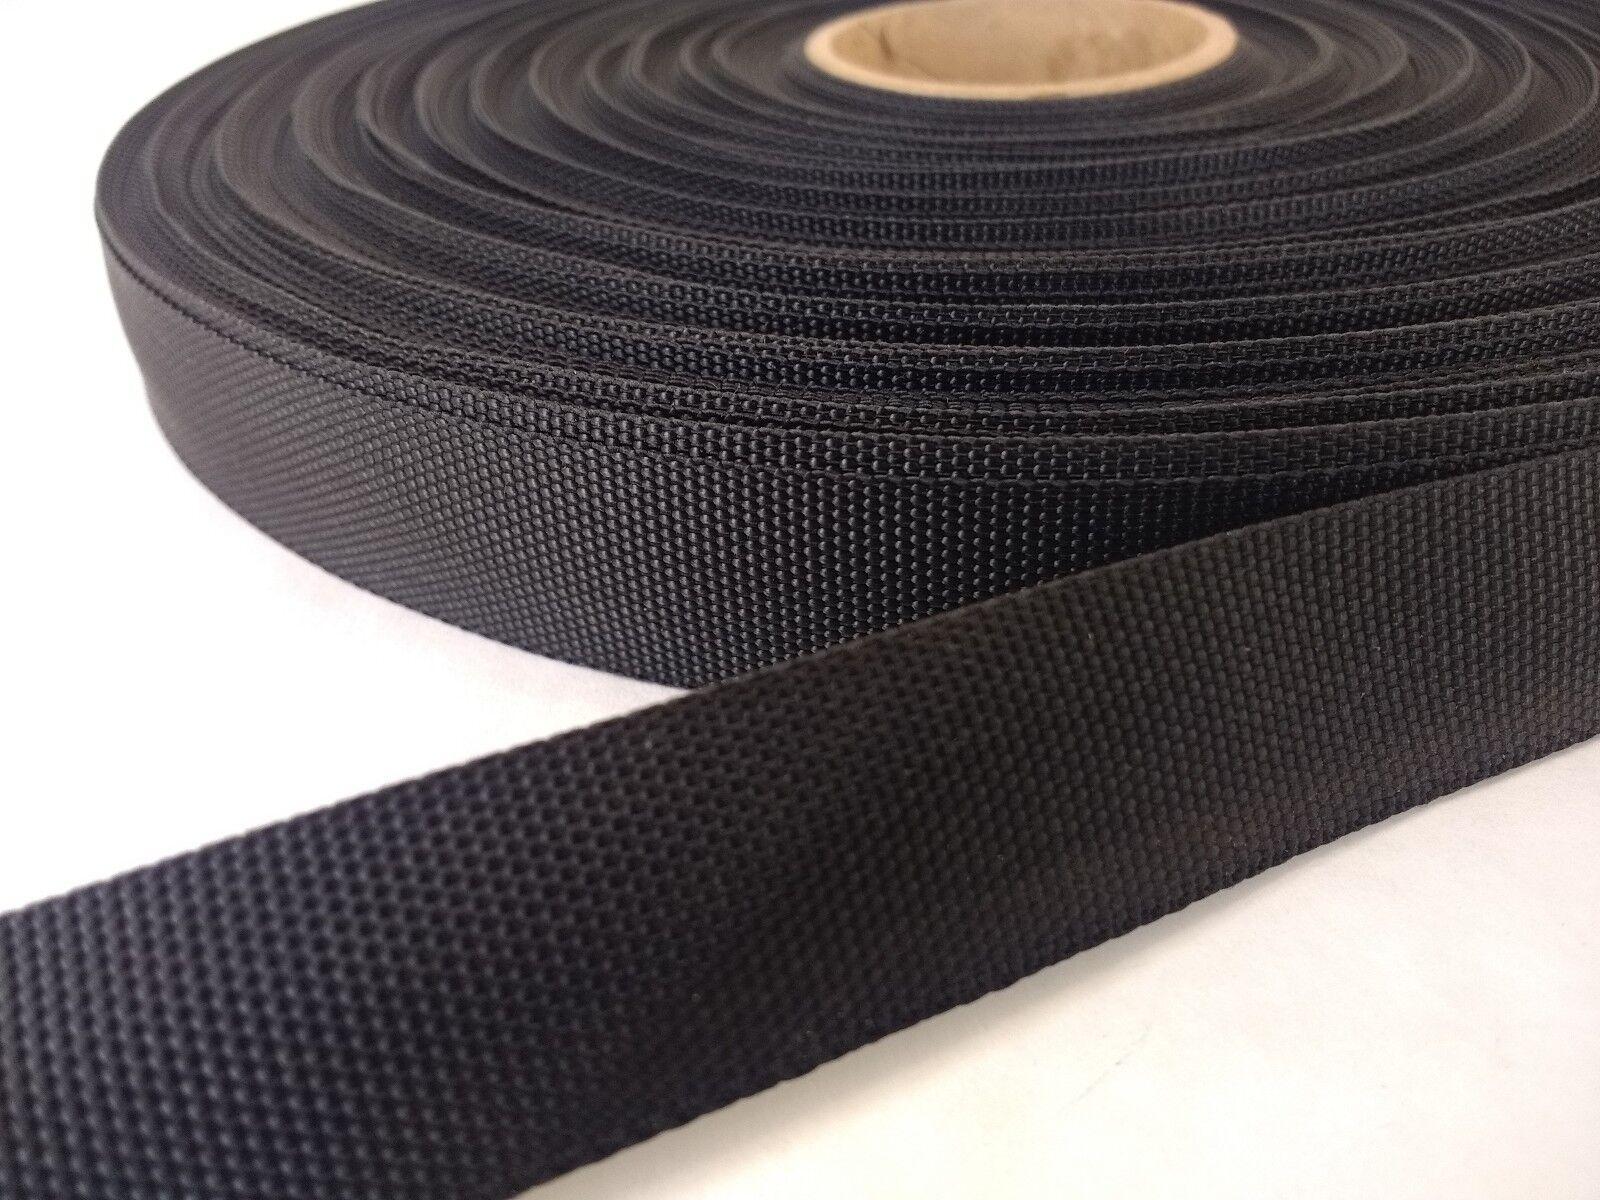 25 feet of 3//4 inch wide BLACK very lightweight nylon webbing .5mm